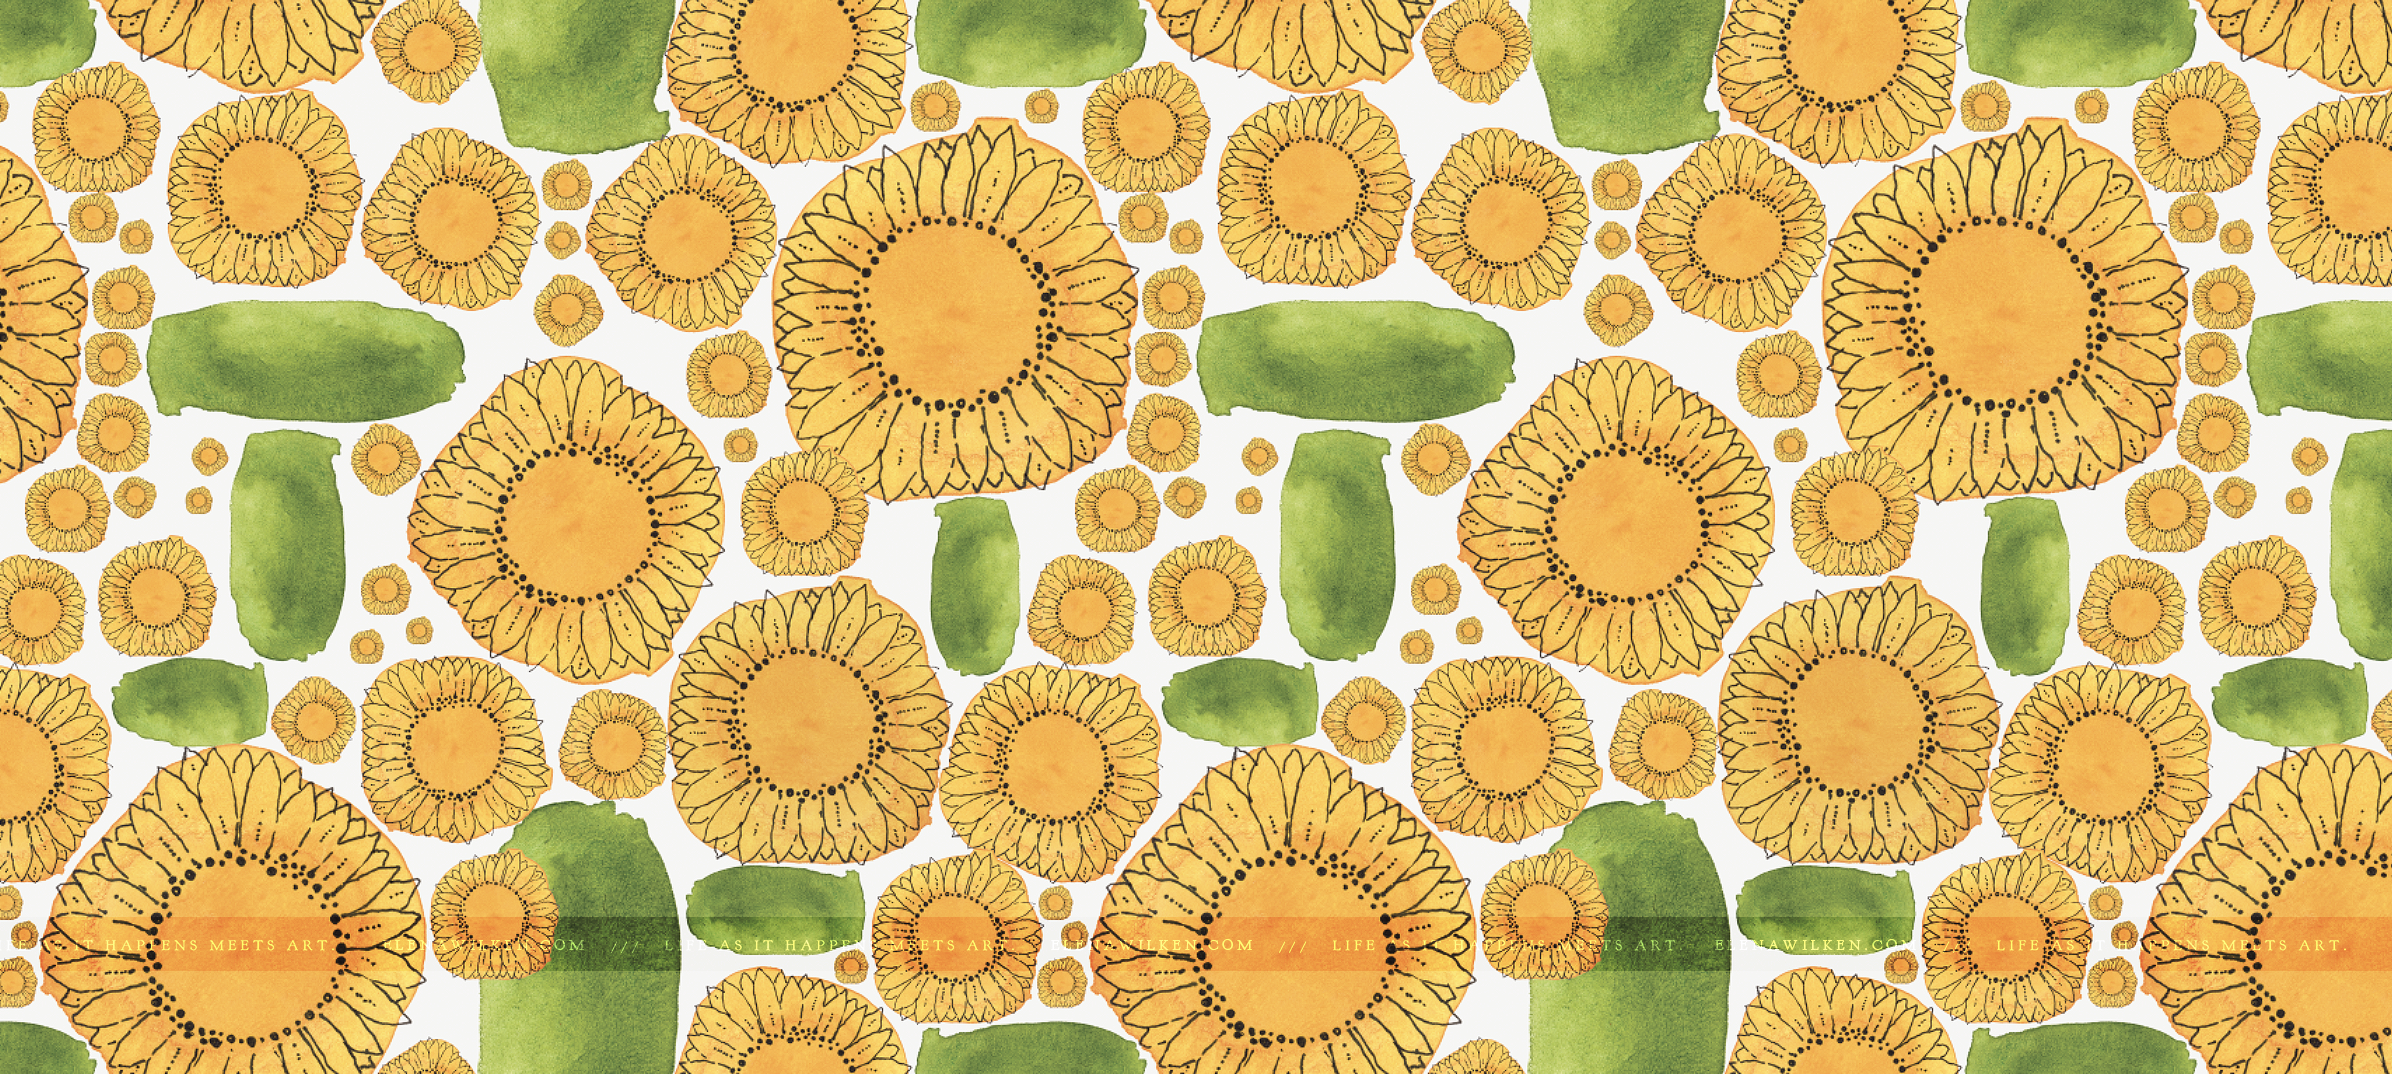 elena-wilken-whimsical-watercolor-fields-surface-pattern-design3.png